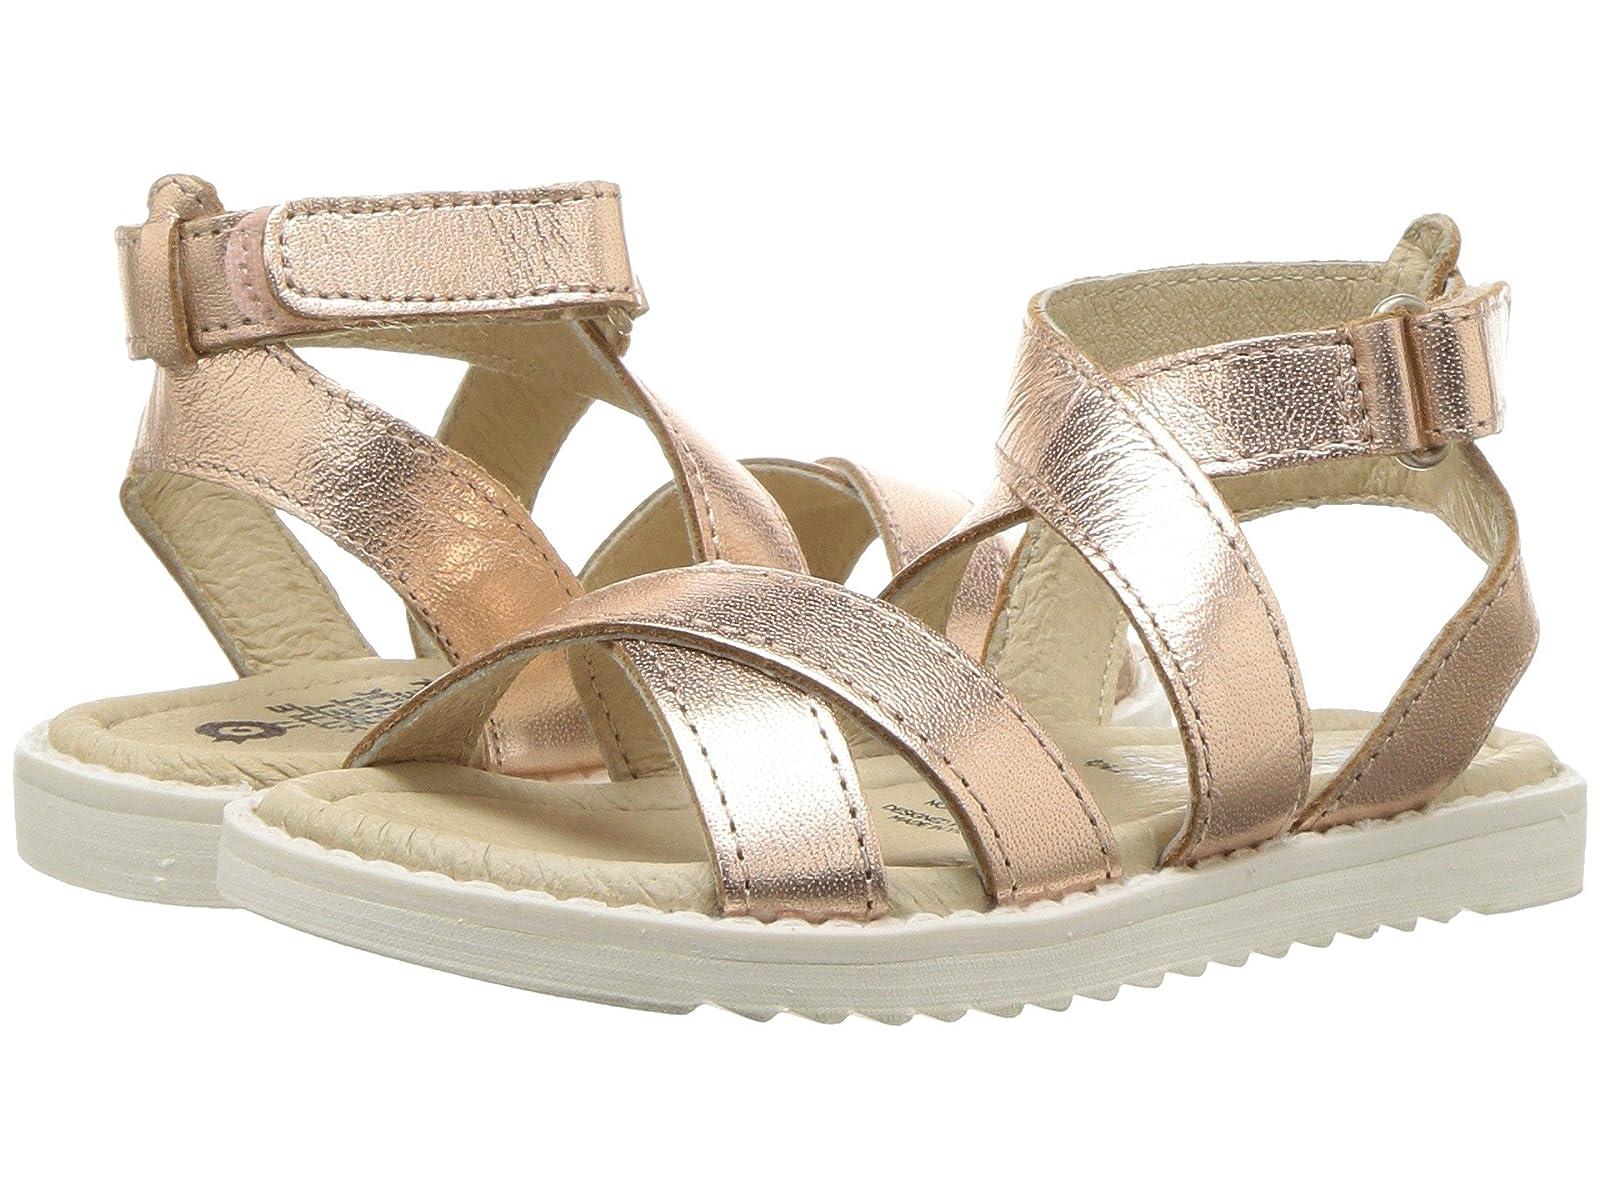 Old Soles Magnolia (Toddler/Little Kid)Atmospheric grades have affordable shoes